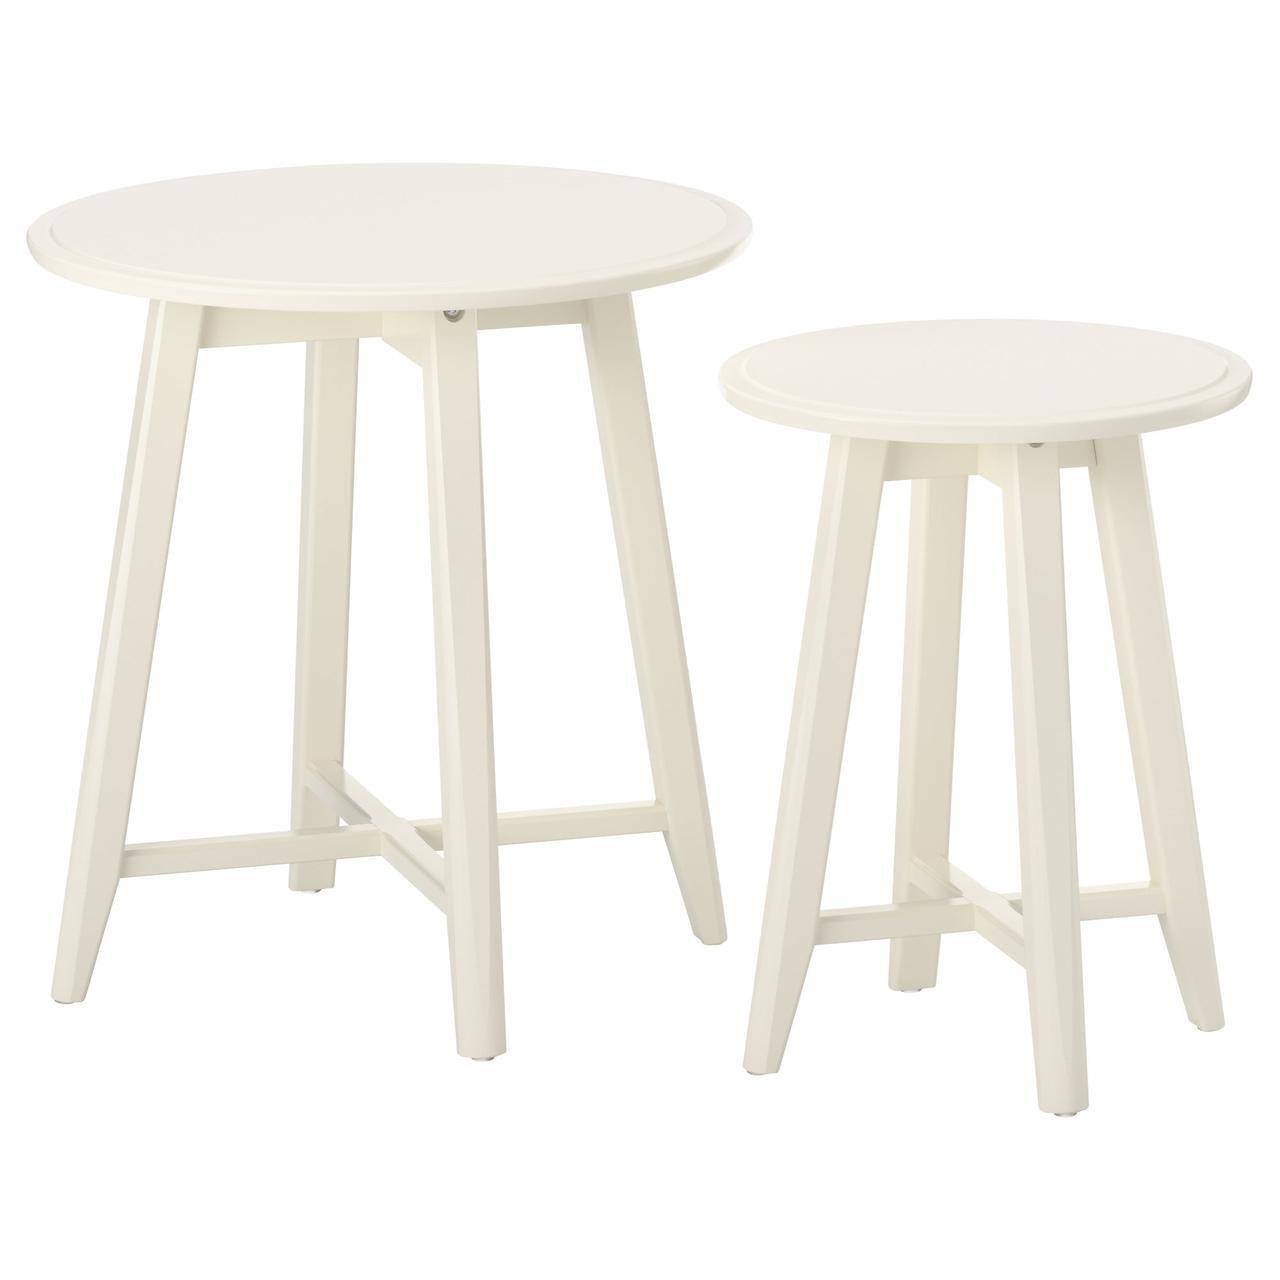 IKEA KRAGSTA (202.998.29) Журнальный столикы, 2 шт.